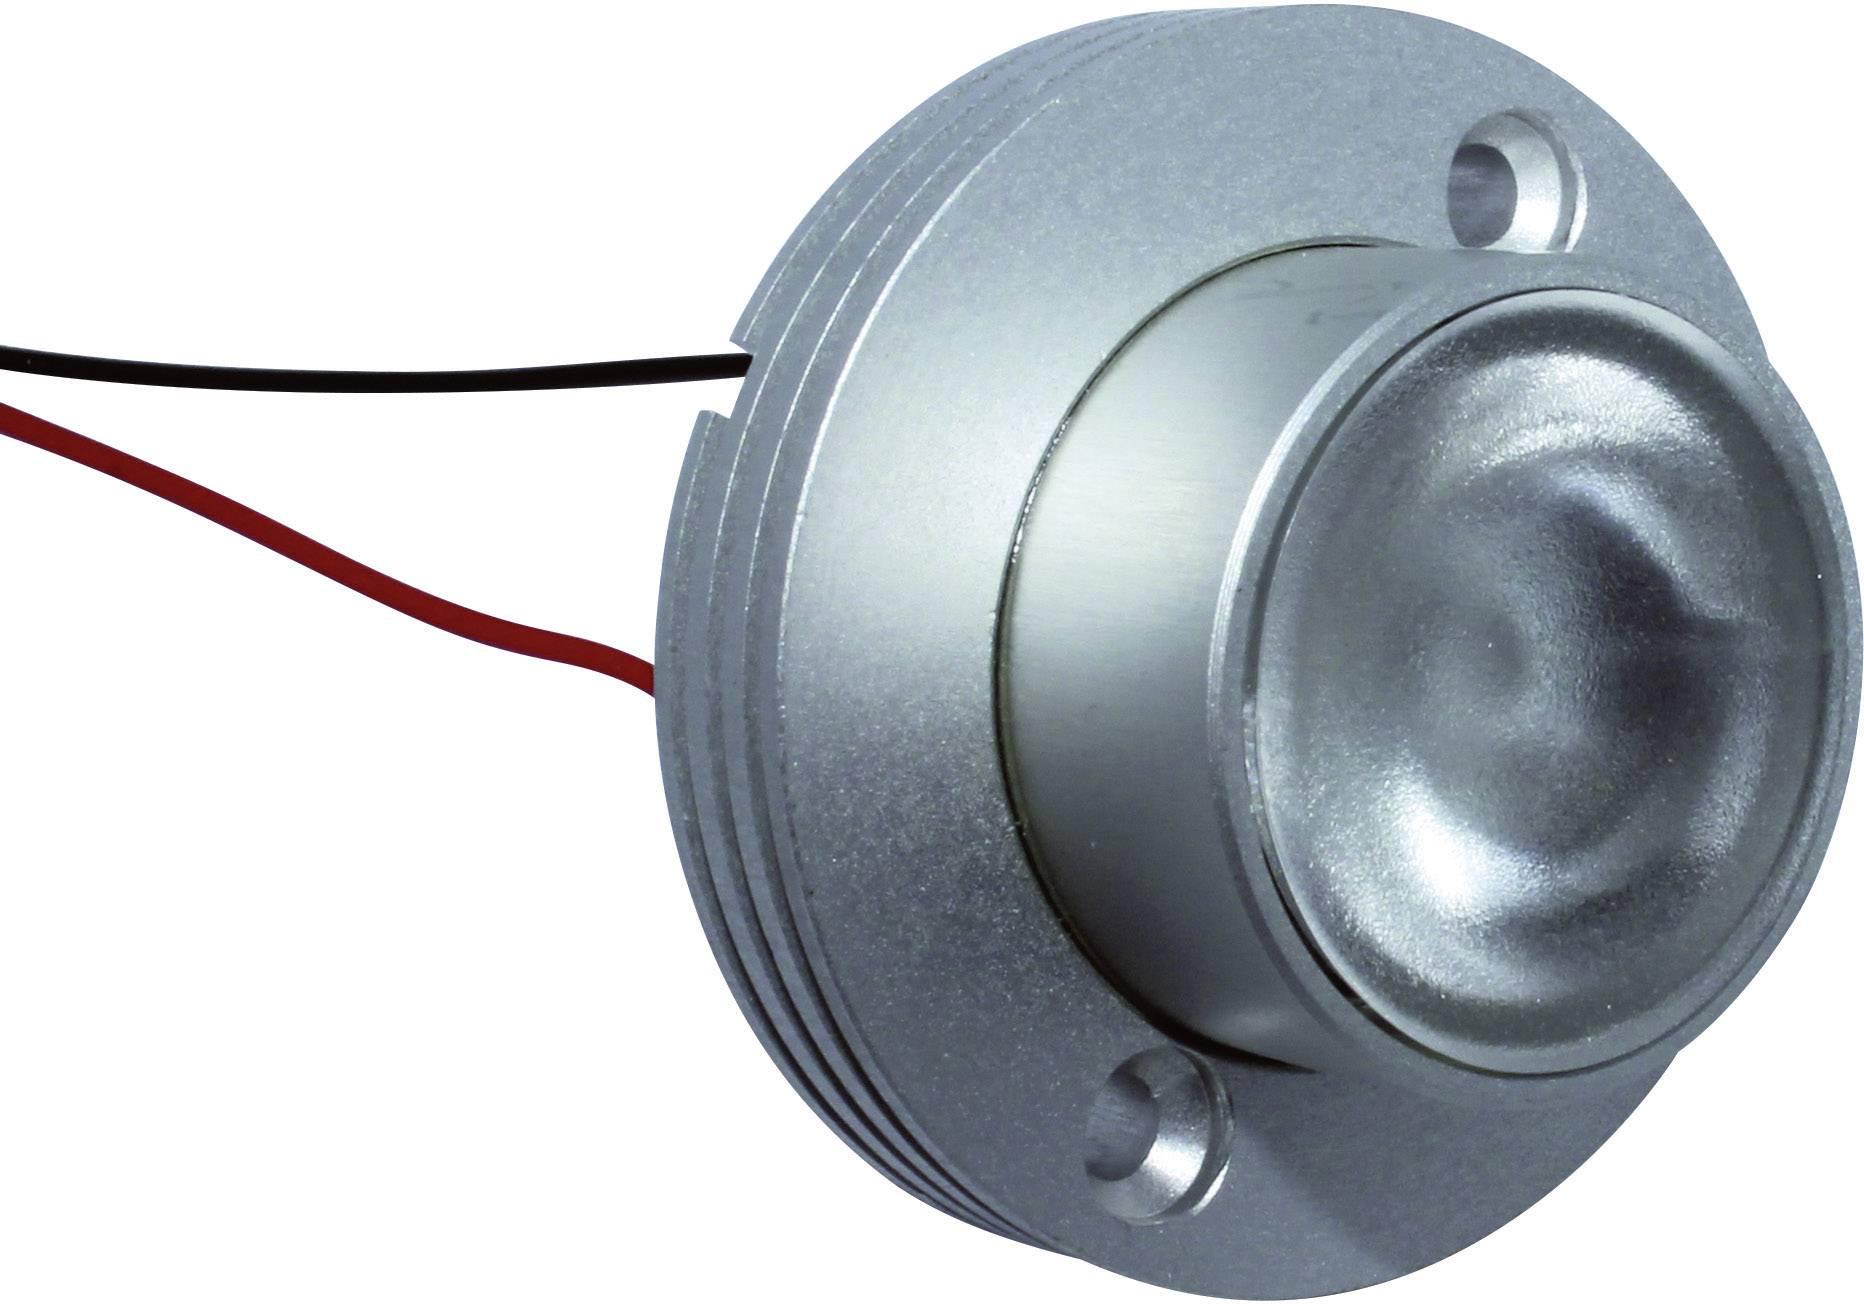 HighPower LED-spot Signal Construct QAUR1131L030, 15 °, 80 lm, 1 W, 3.3 V, jantárová